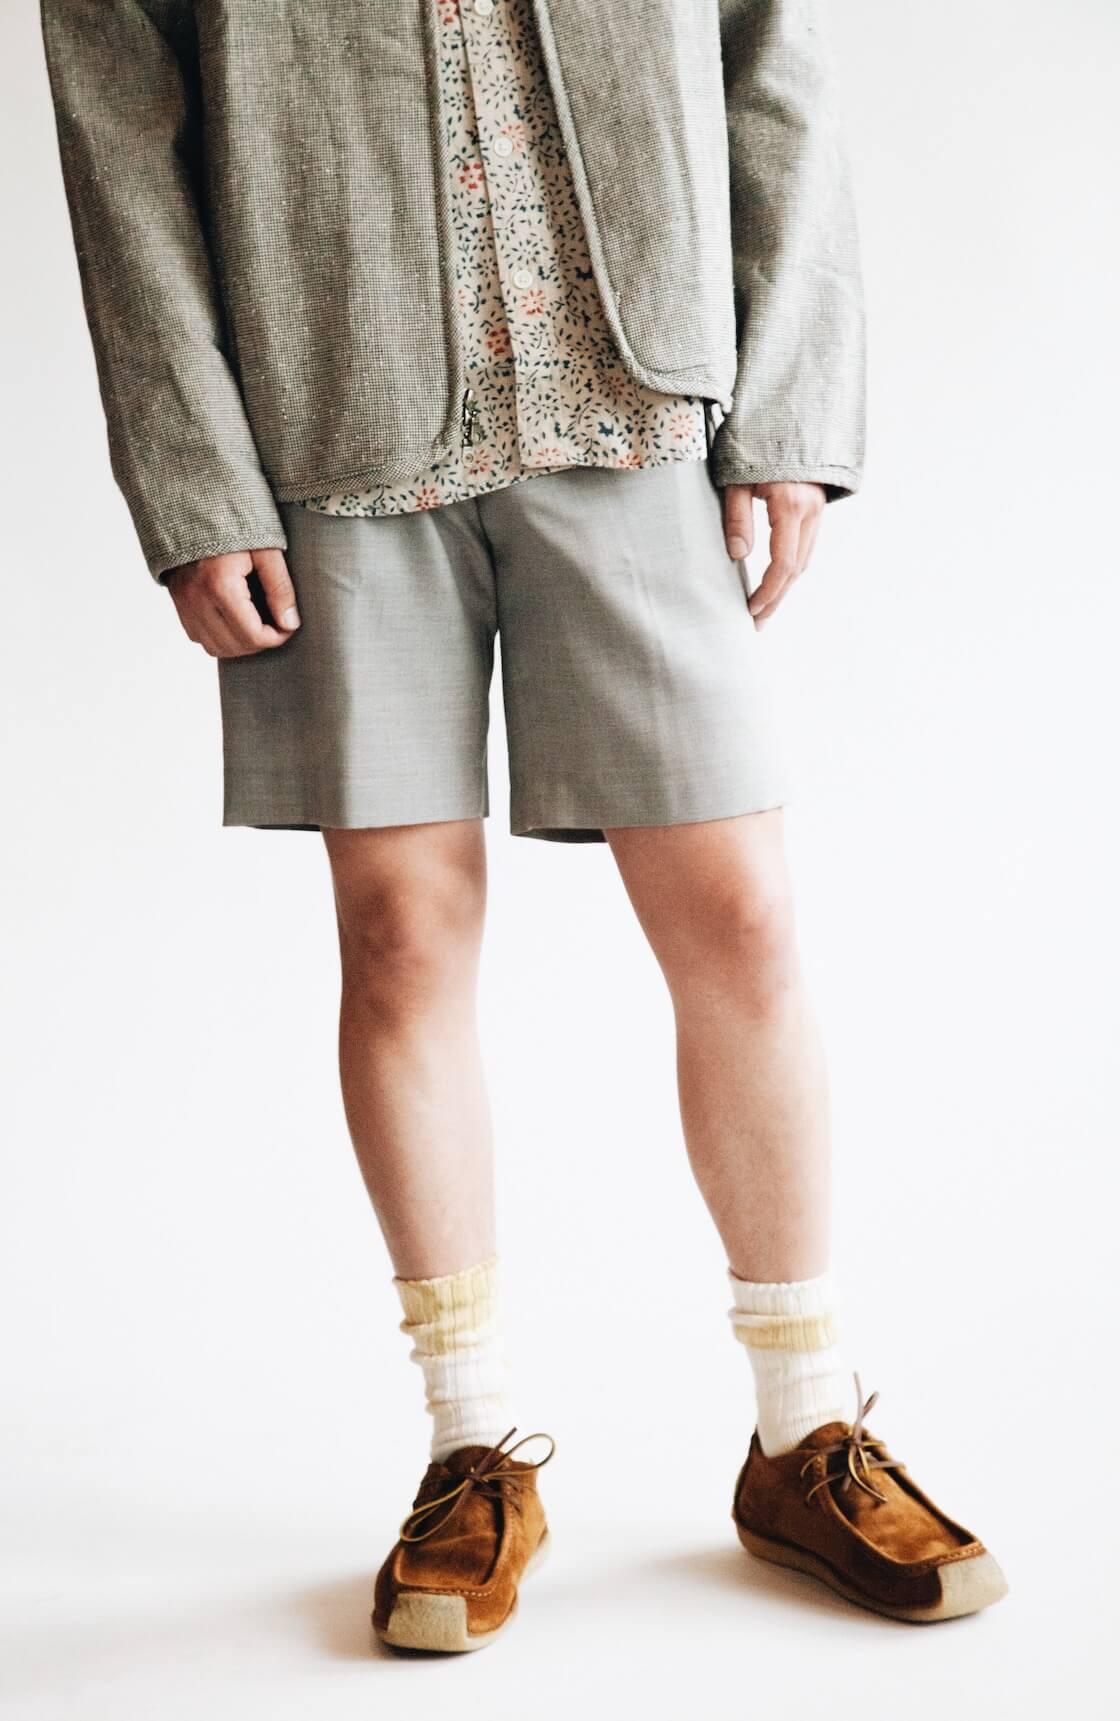 Collarless Jacket from Corridor, Natural Handblock Floral shirt from Corridor, Pavel Trouser Shorts from Harmony and Yuks Type 3 chukkas from Yuketen on body